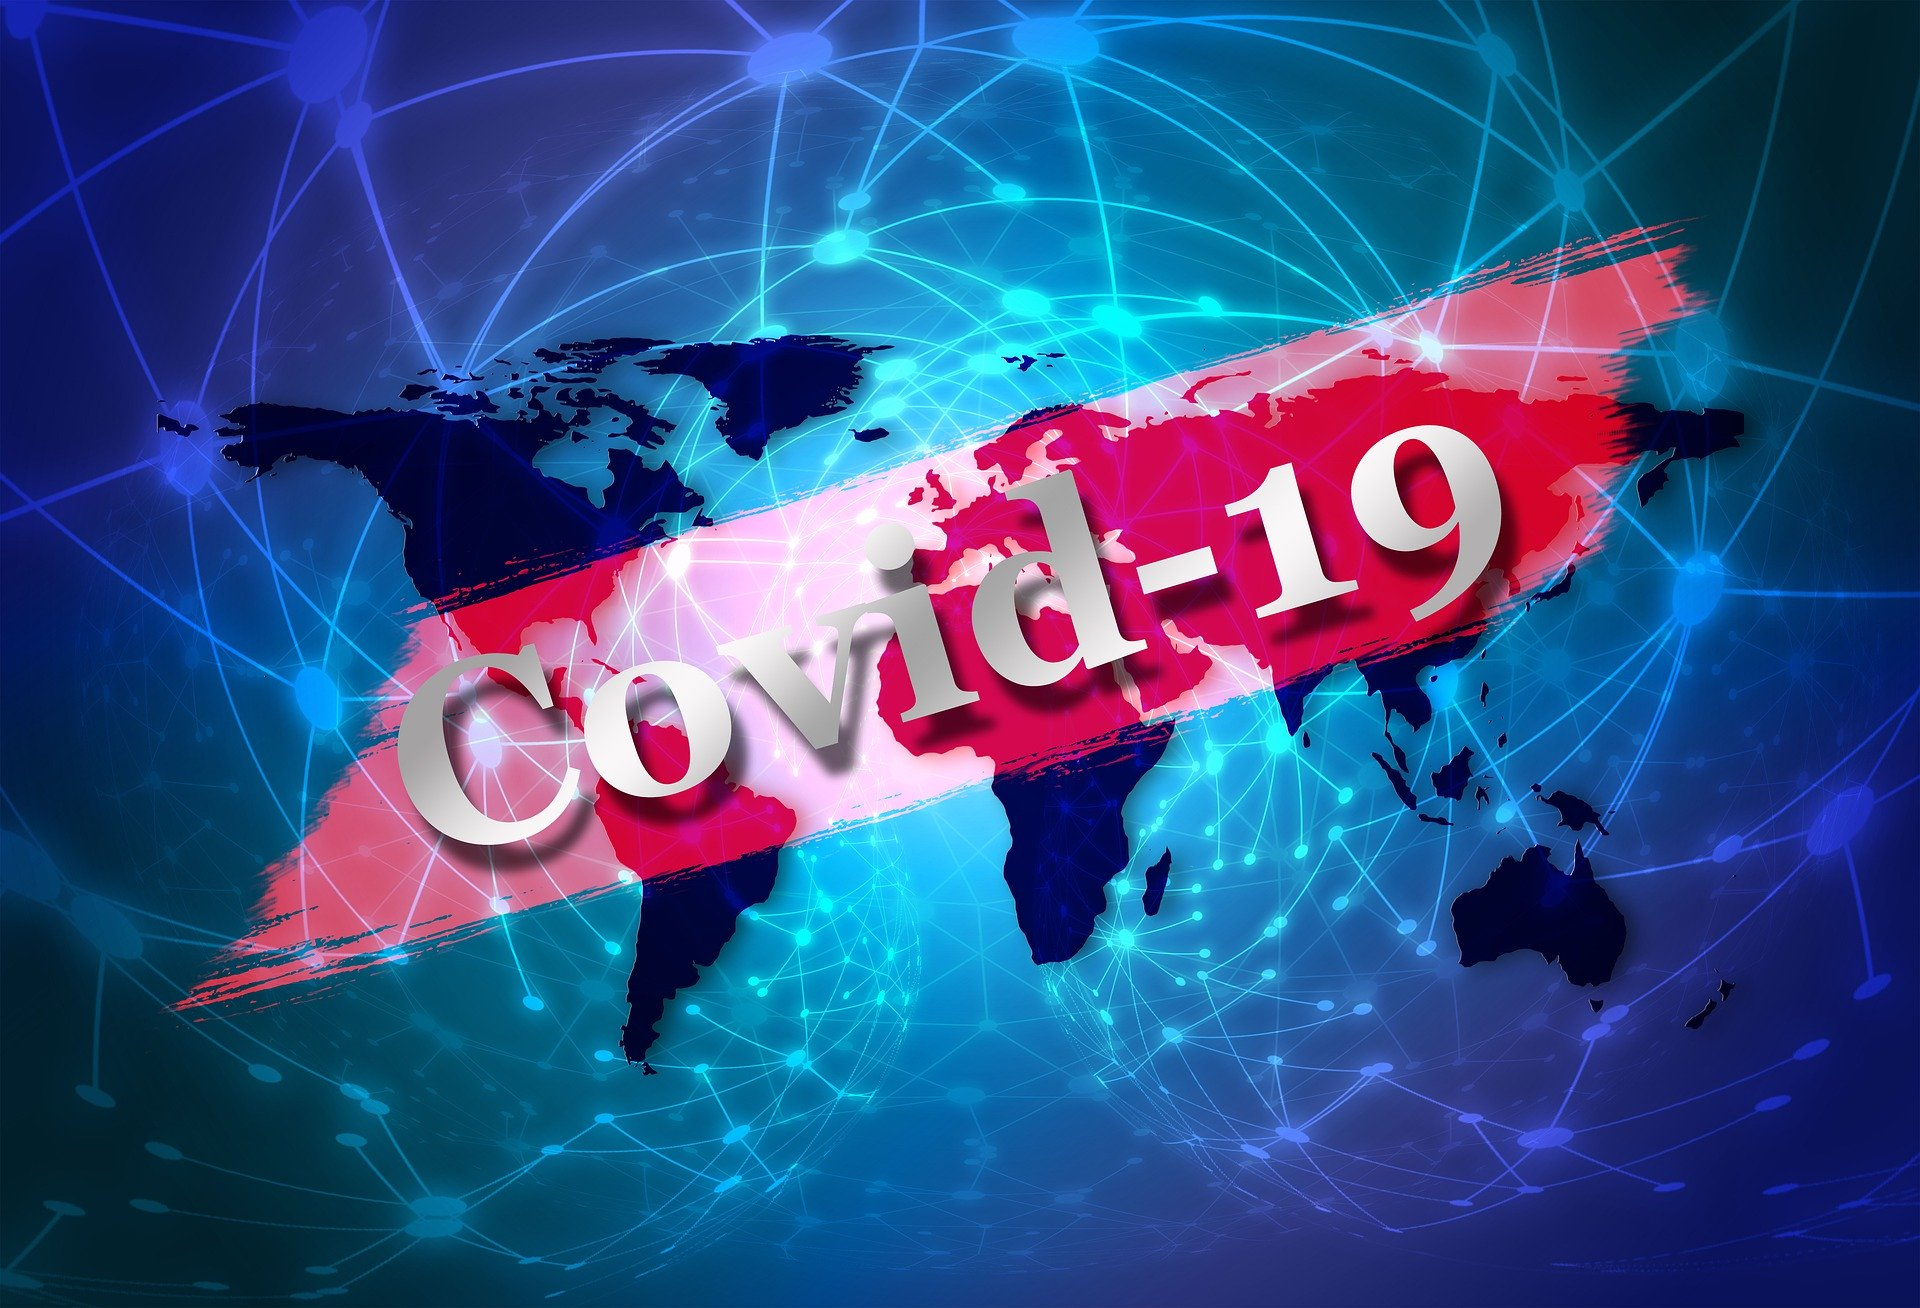 Restricciones de viaje a causa del COVID